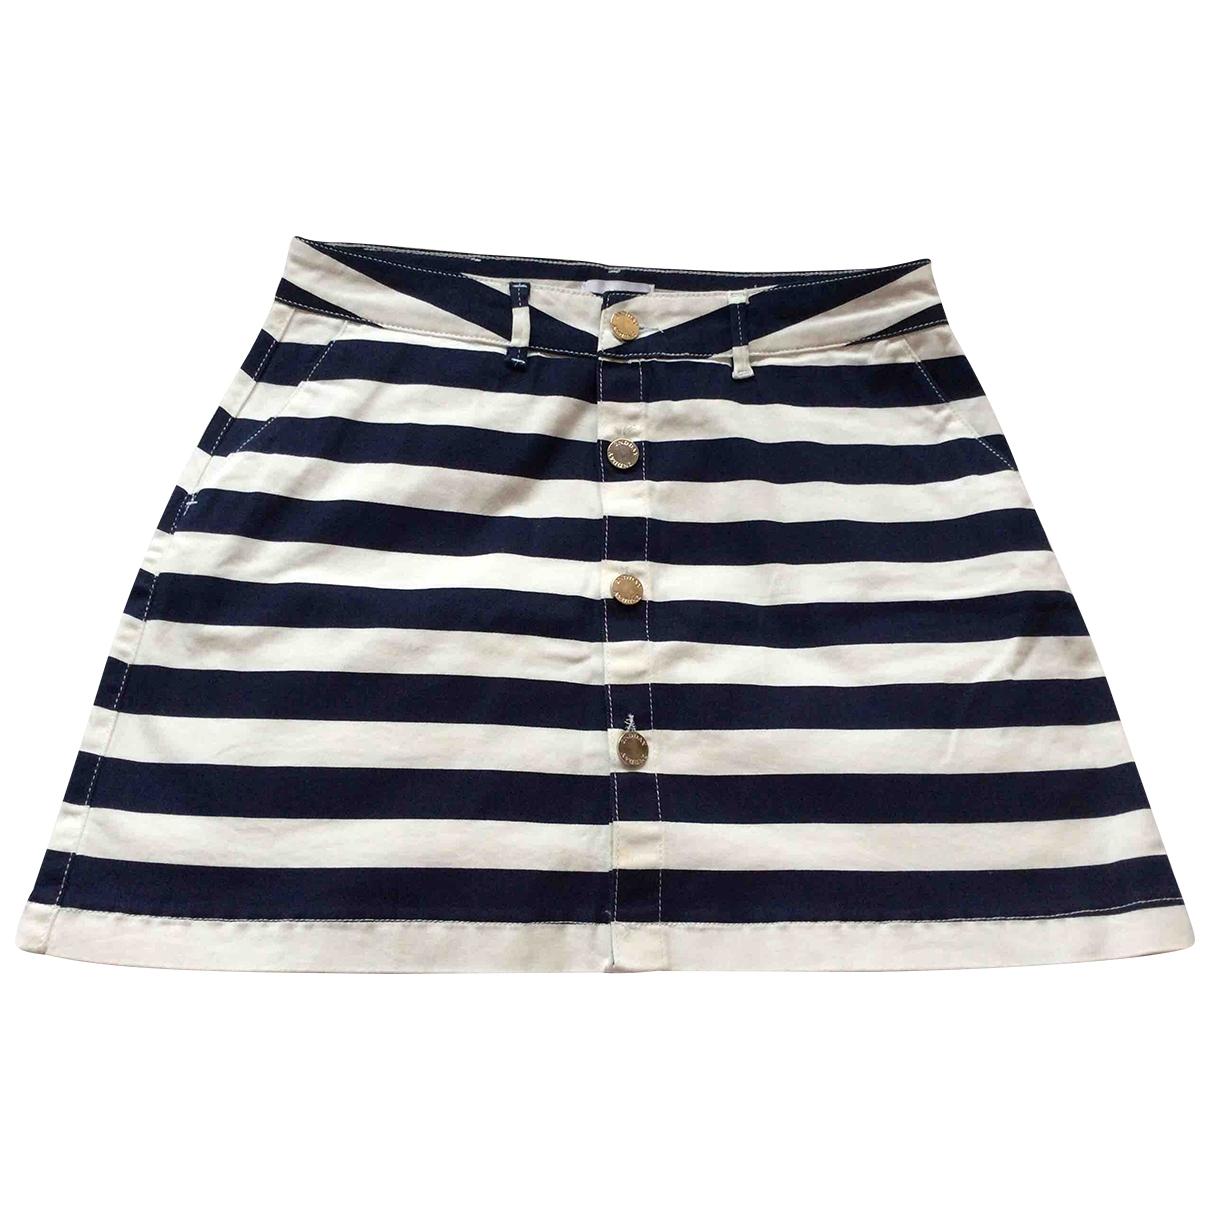 2nd Day - Jupe   pour femme en coton - elasthane - marine